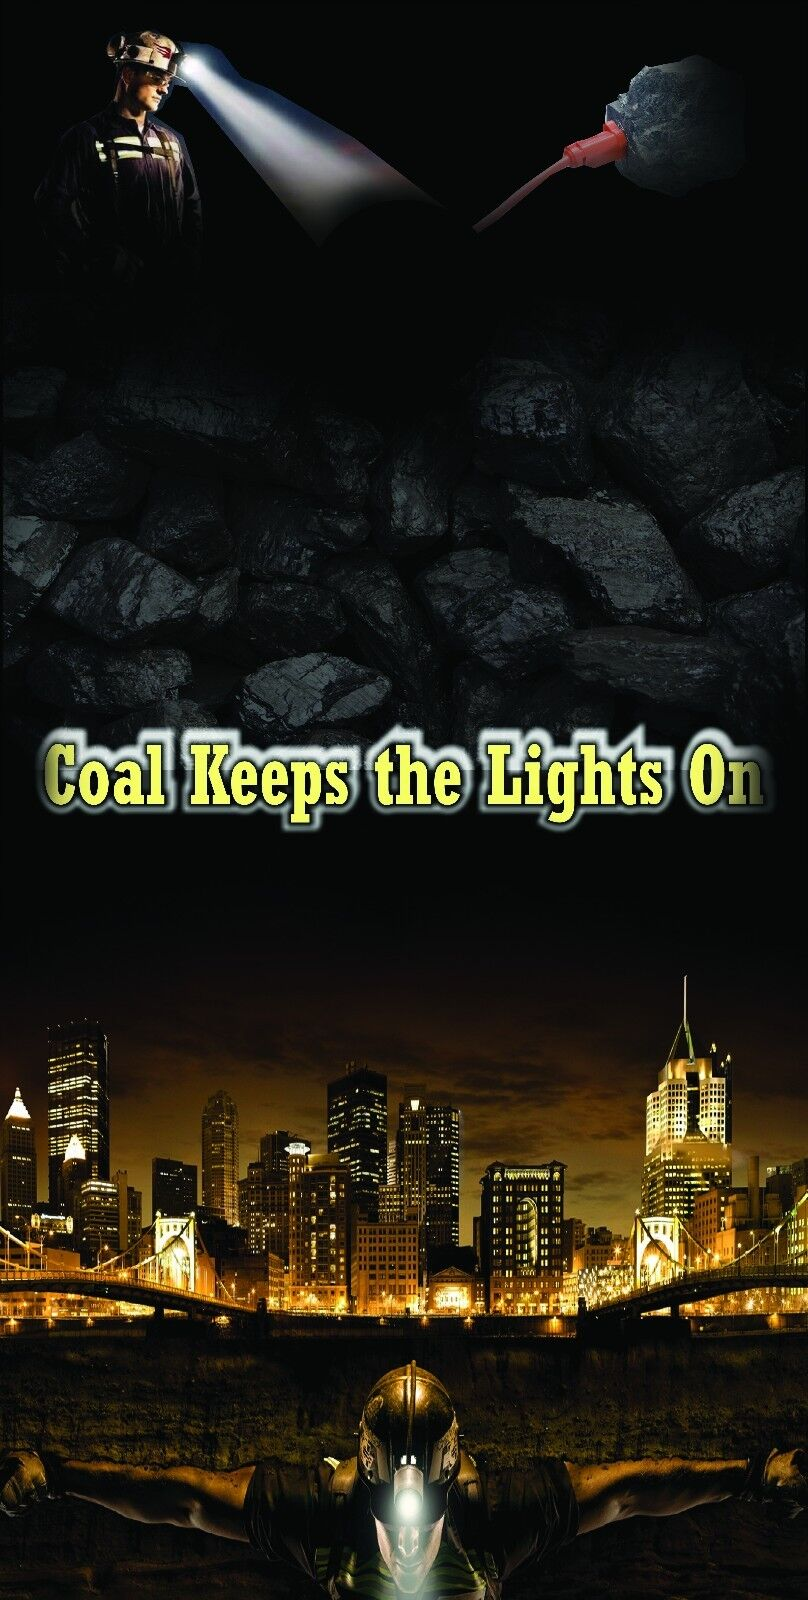 Coal Keeps the Lights On  Cornhole Bean Bag Toss 3M Vinyl Wrap Set  hot limited edition